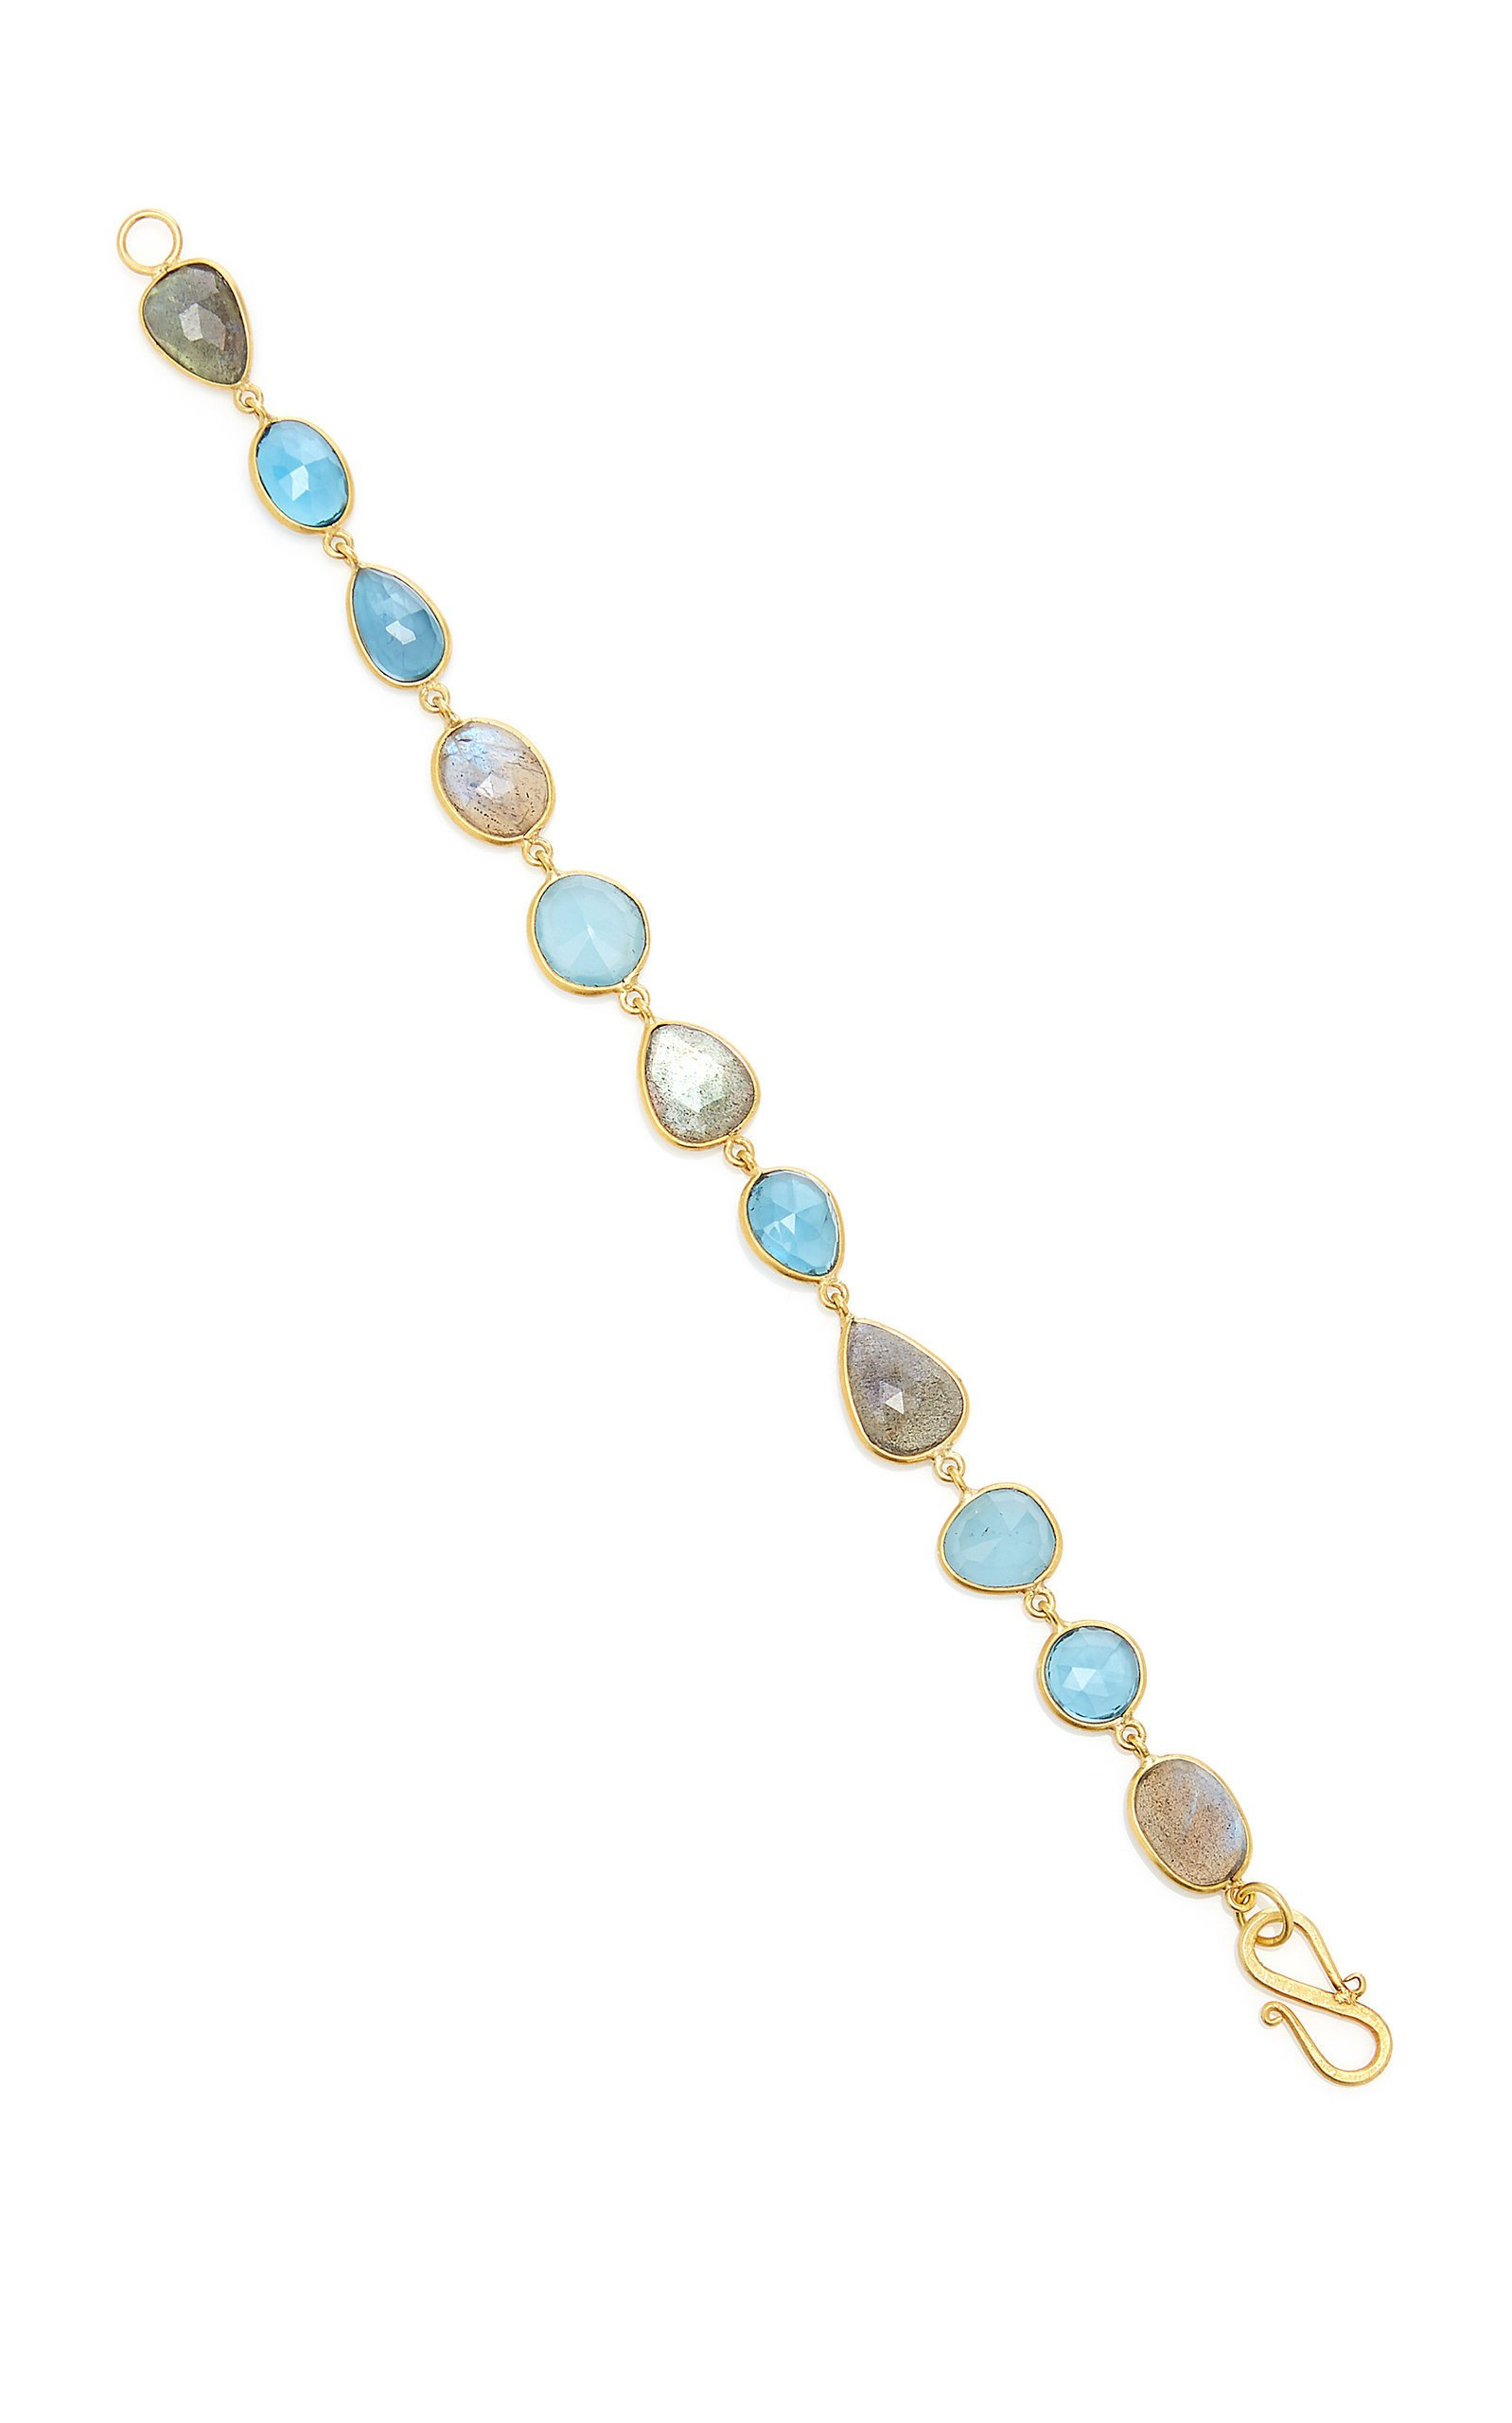 Bahina One of a Kind London Blue Aquamarine and Labradorite Bracelet